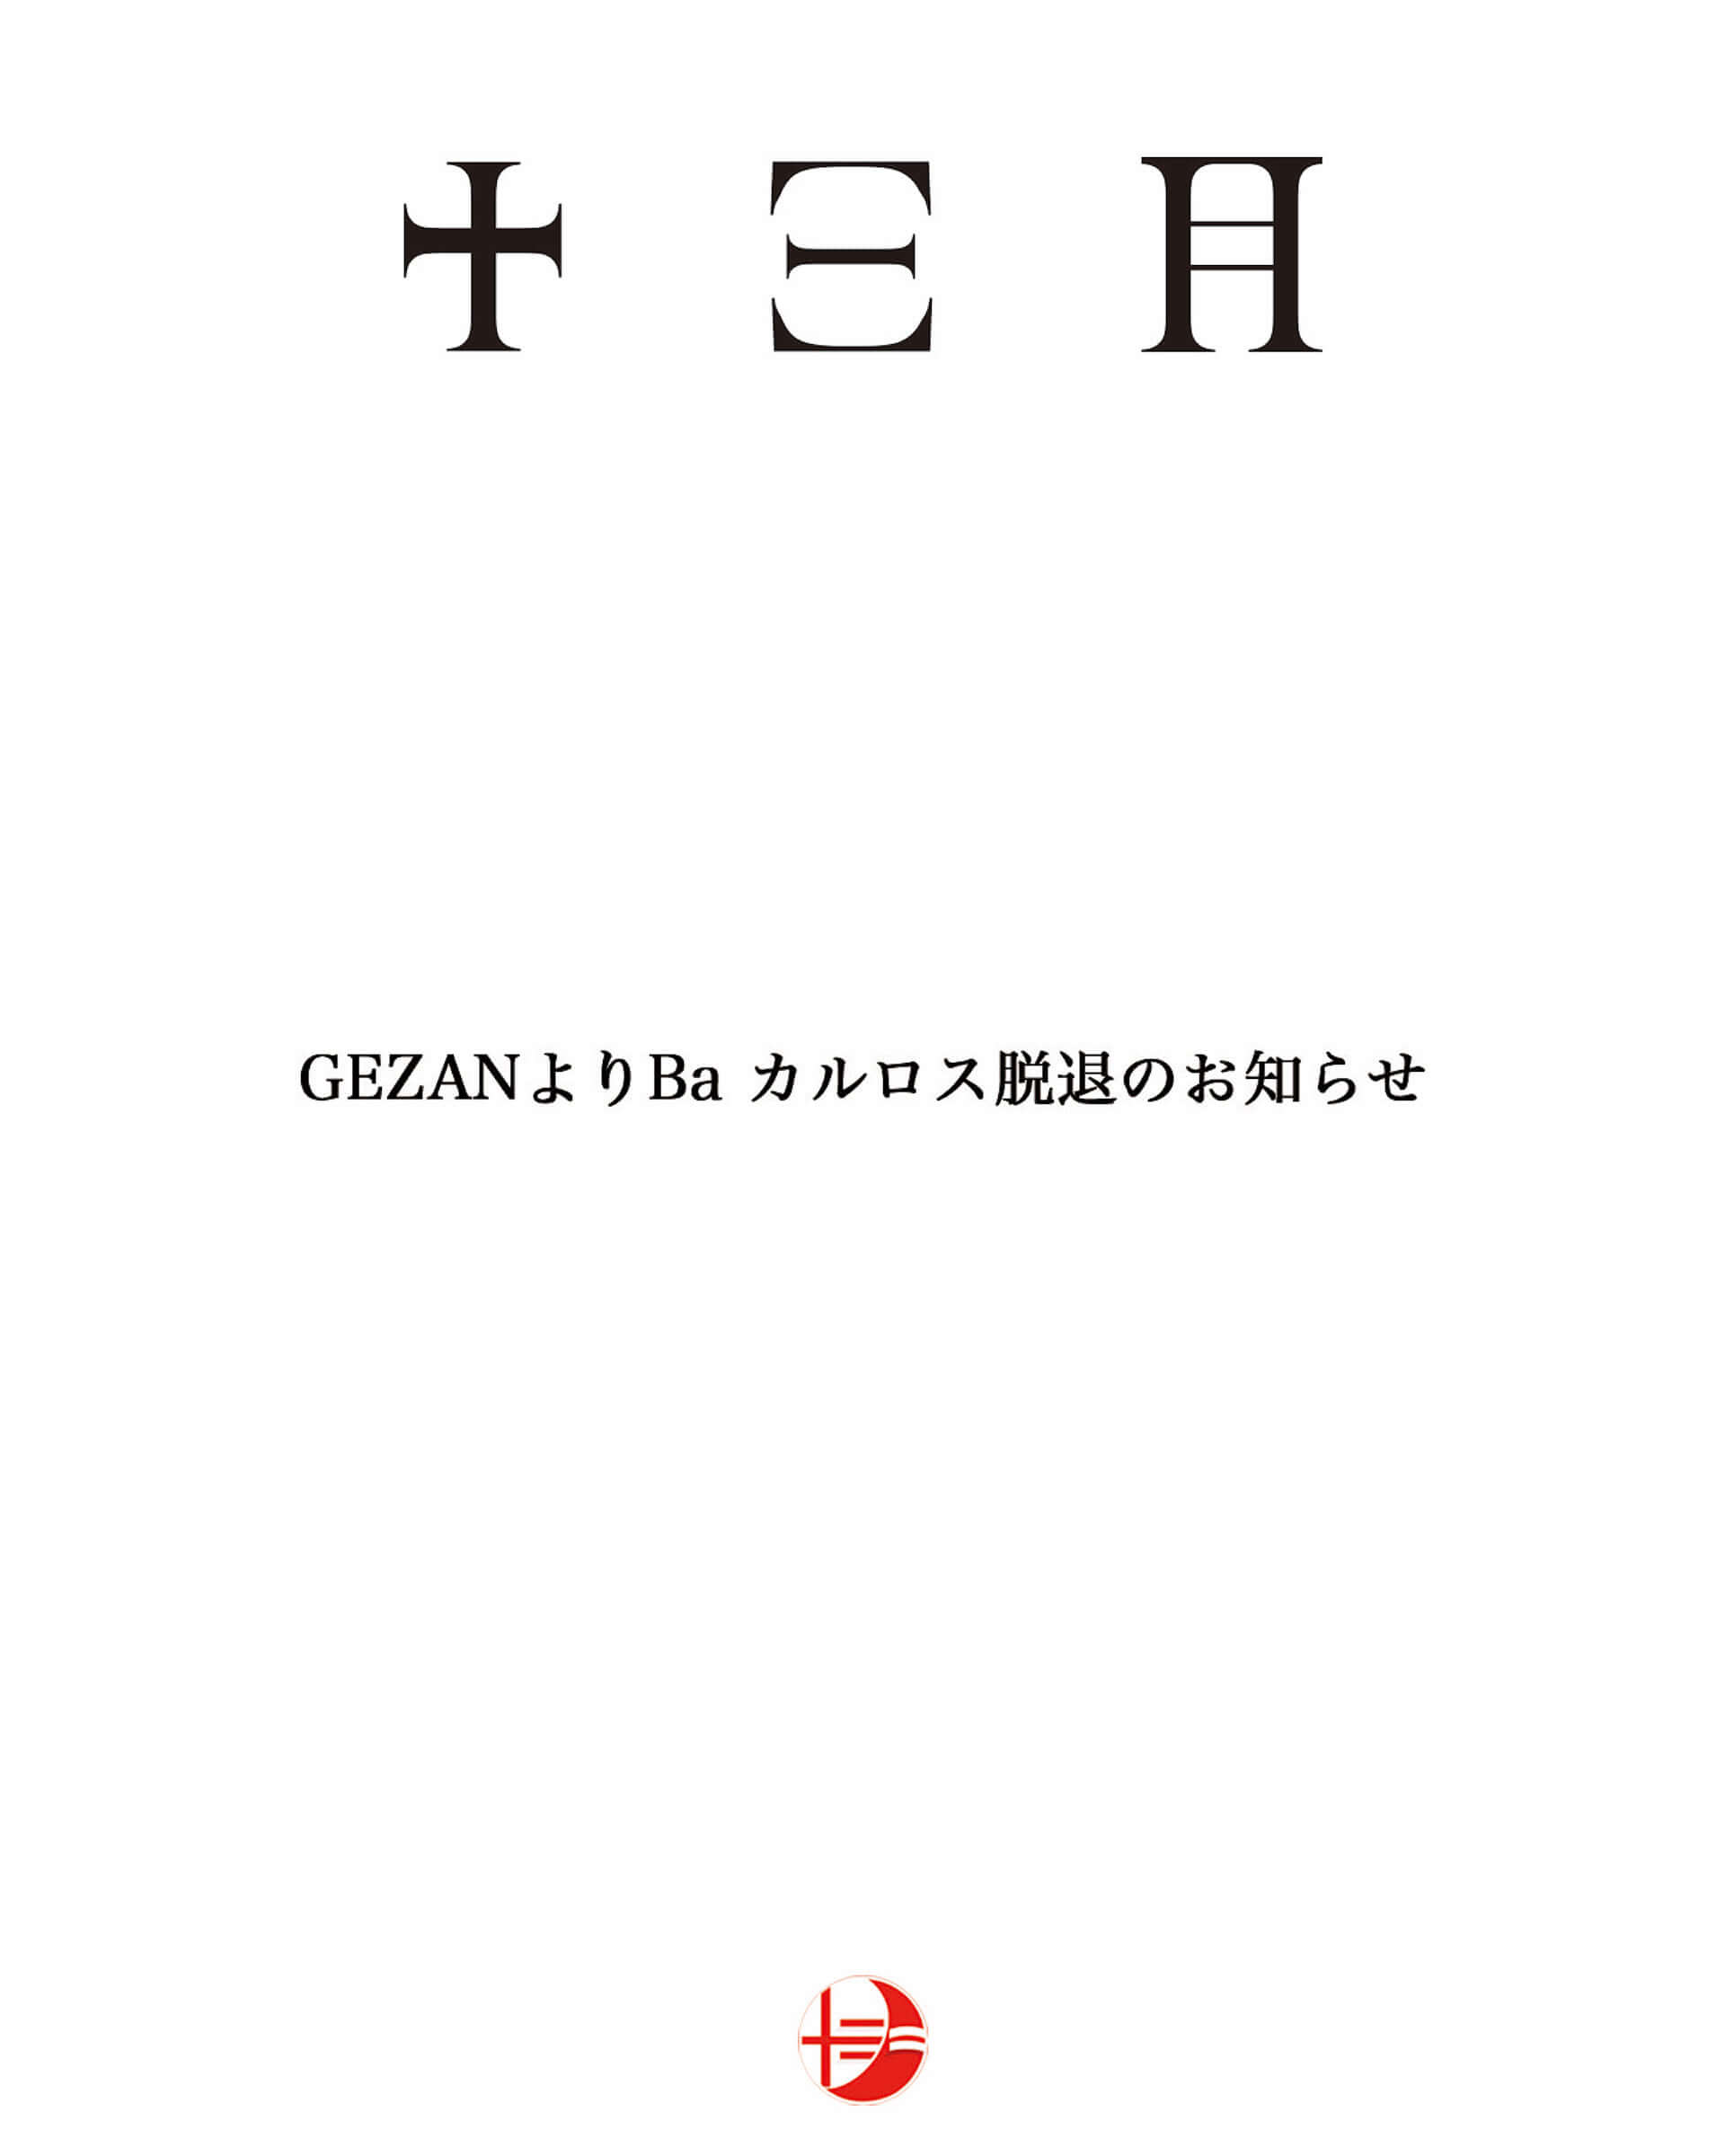 GEZANのベース、カルロスが脱退&コメントが到着「自分らしく笑顔が溢れる人生を」 music210202_gezan_3-1920x2400